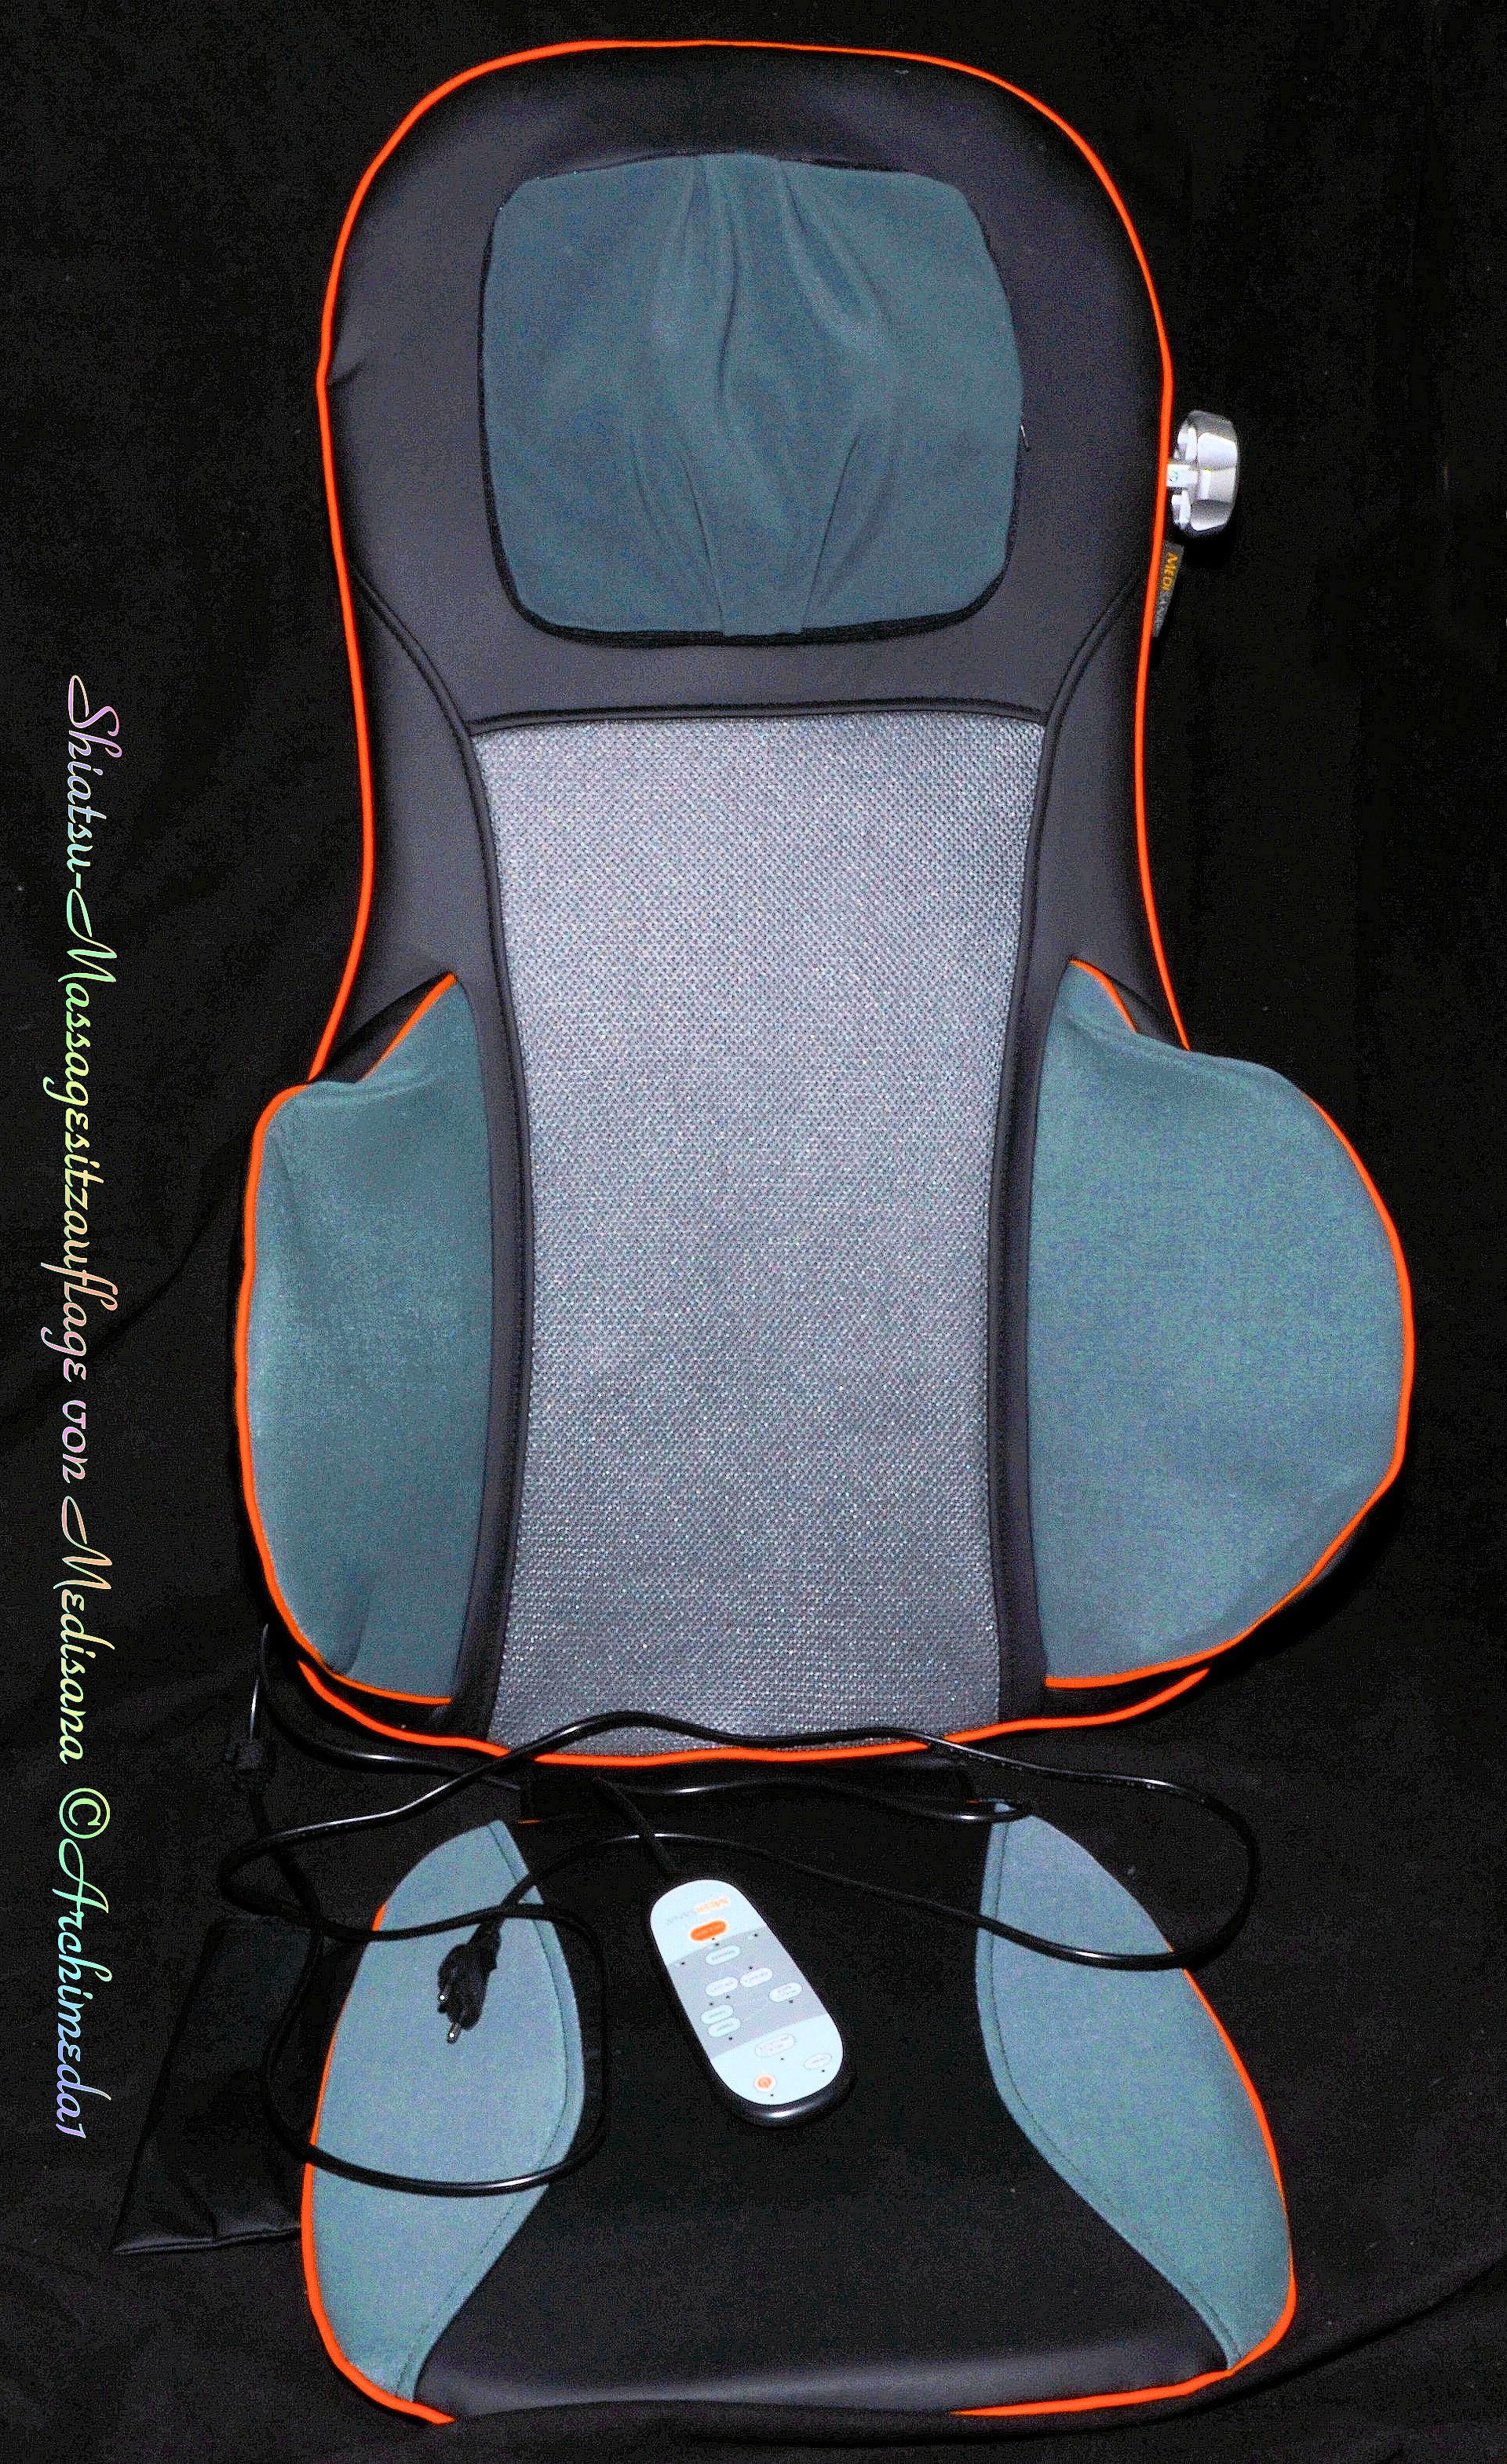 medisana massage sitzauflage excellent gebraucht medisana. Black Bedroom Furniture Sets. Home Design Ideas